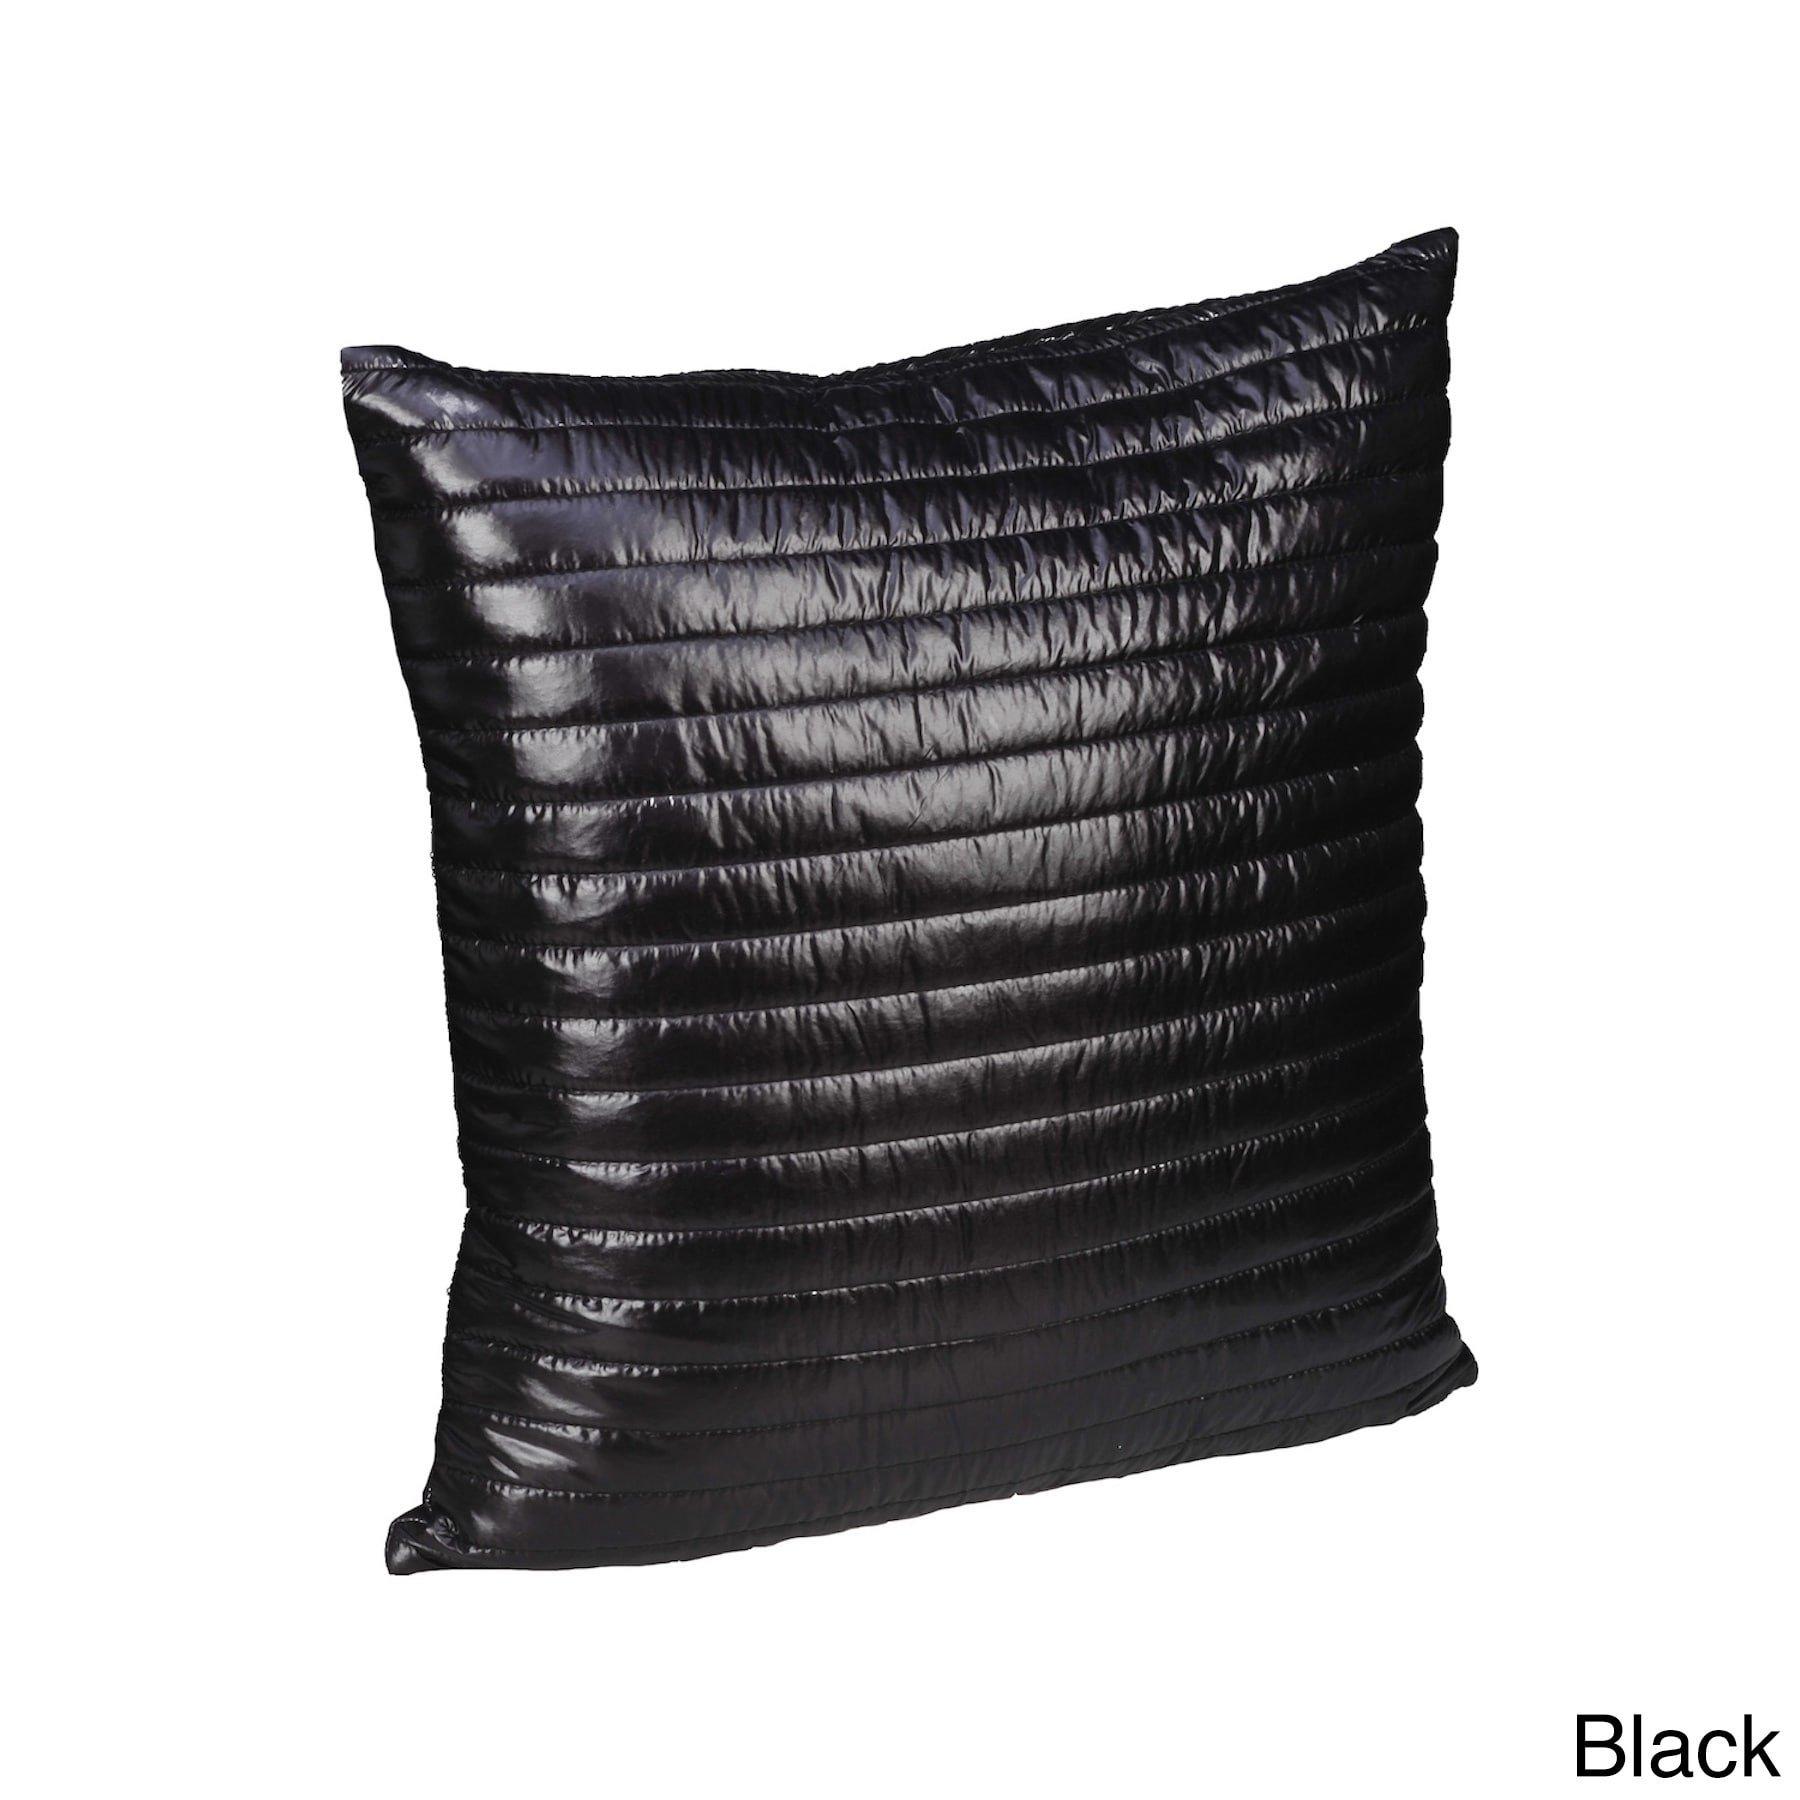 Epoch Hometex, Inc Quilted Lightweight Nylon Decorative Pillow Black